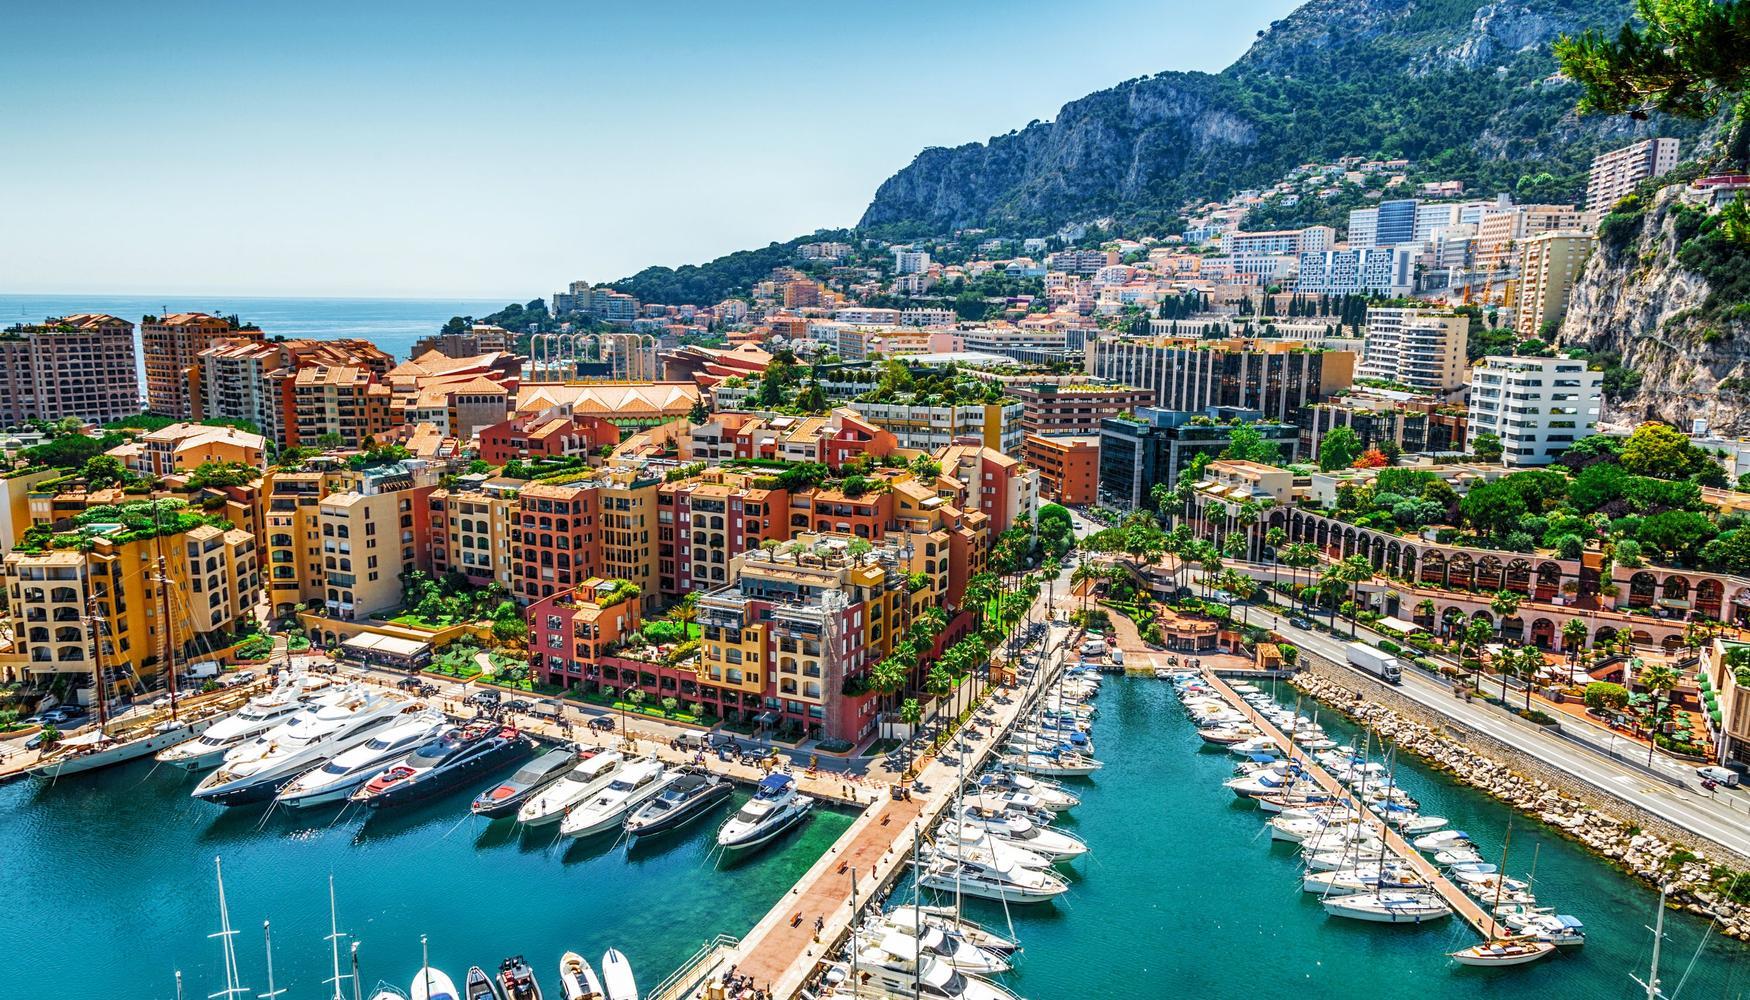 Mietwagen in Monaco